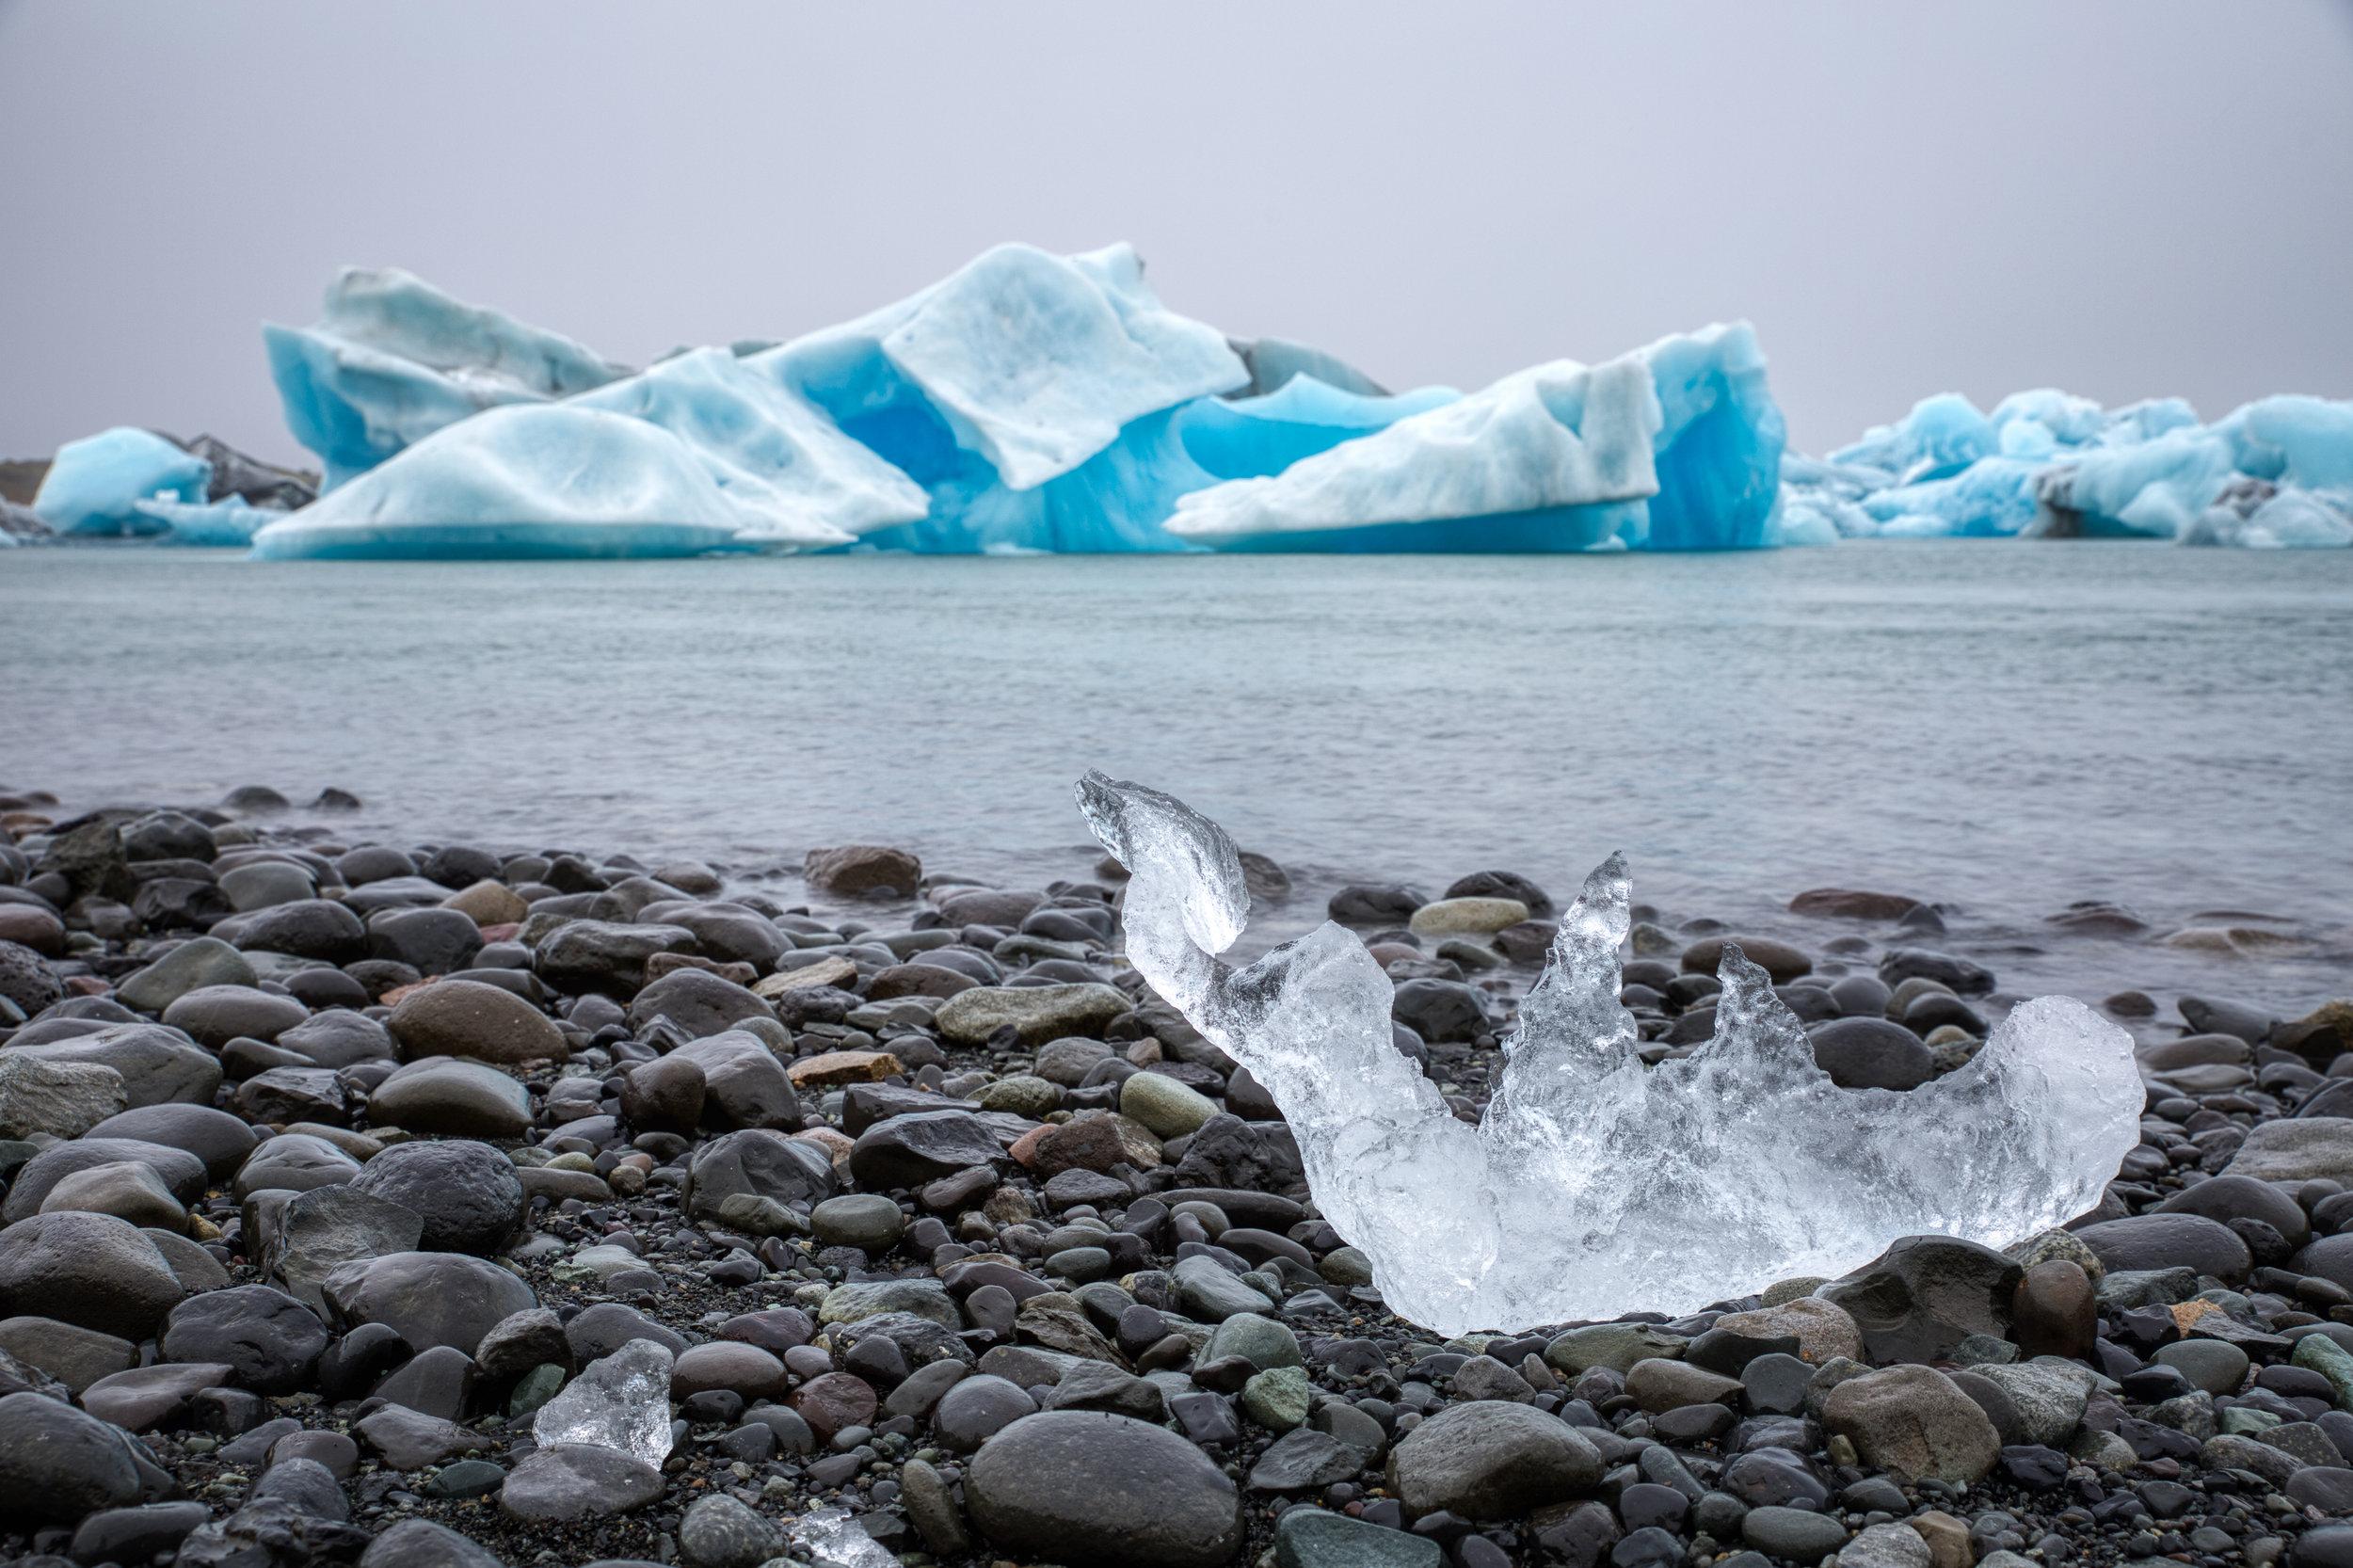 Jokulsarlon - Laguna glaciar en donde veremos enormes icebergs.